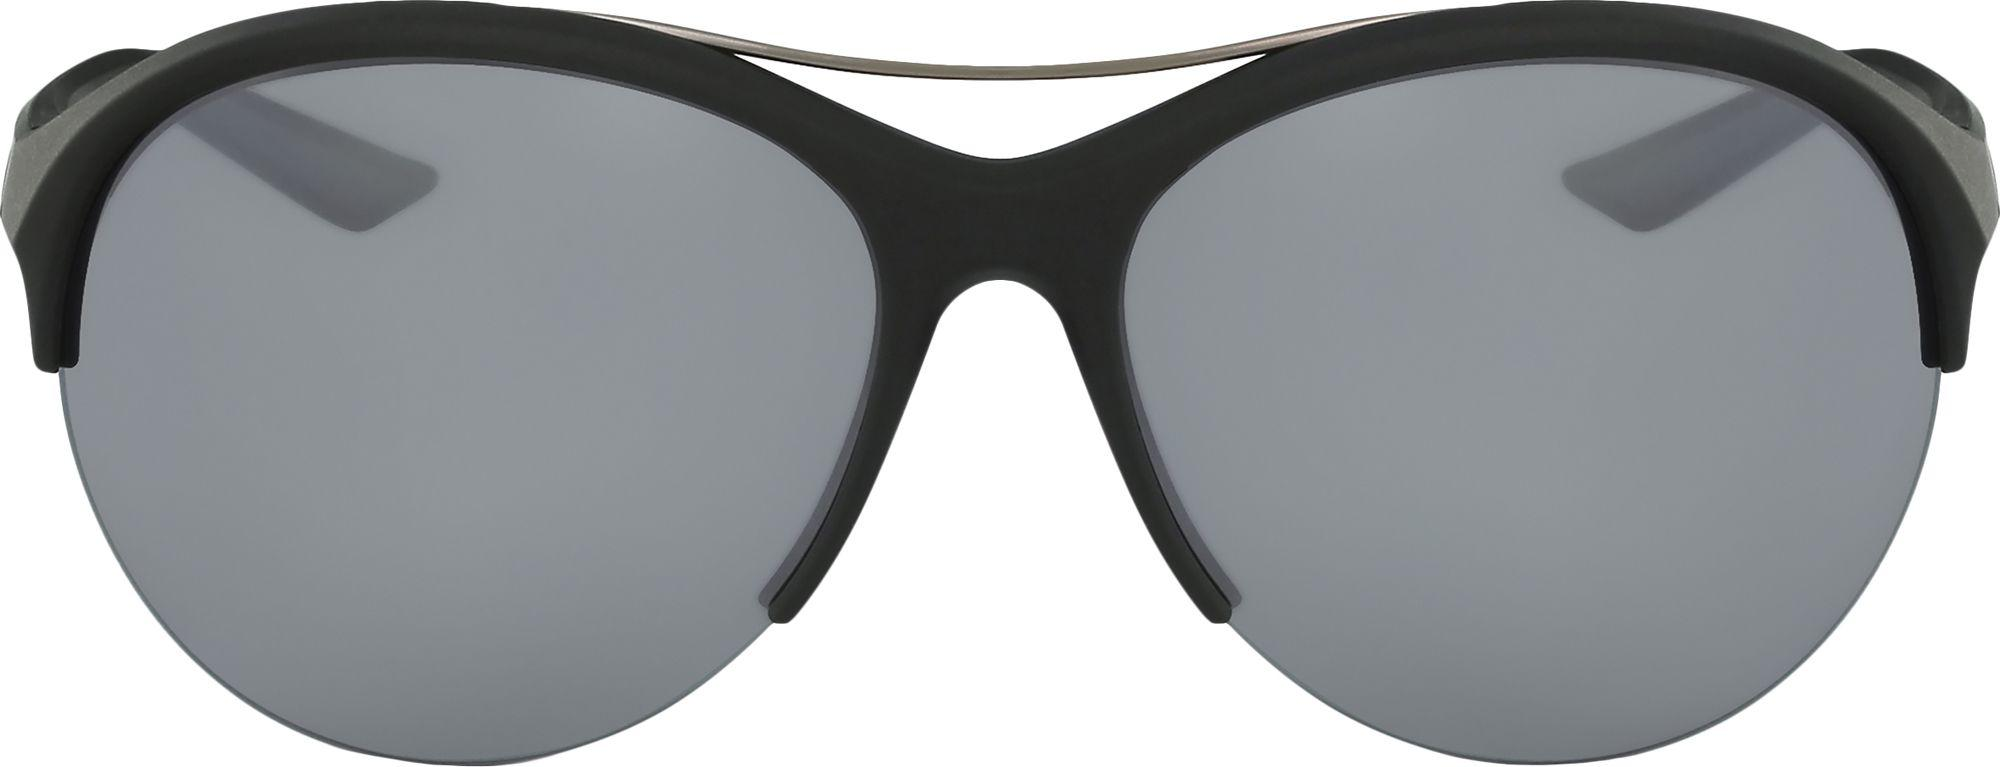 4f19a30067be4 Nike - Gray Flex Momentum Sunglasses for Men - Lyst. View fullscreen